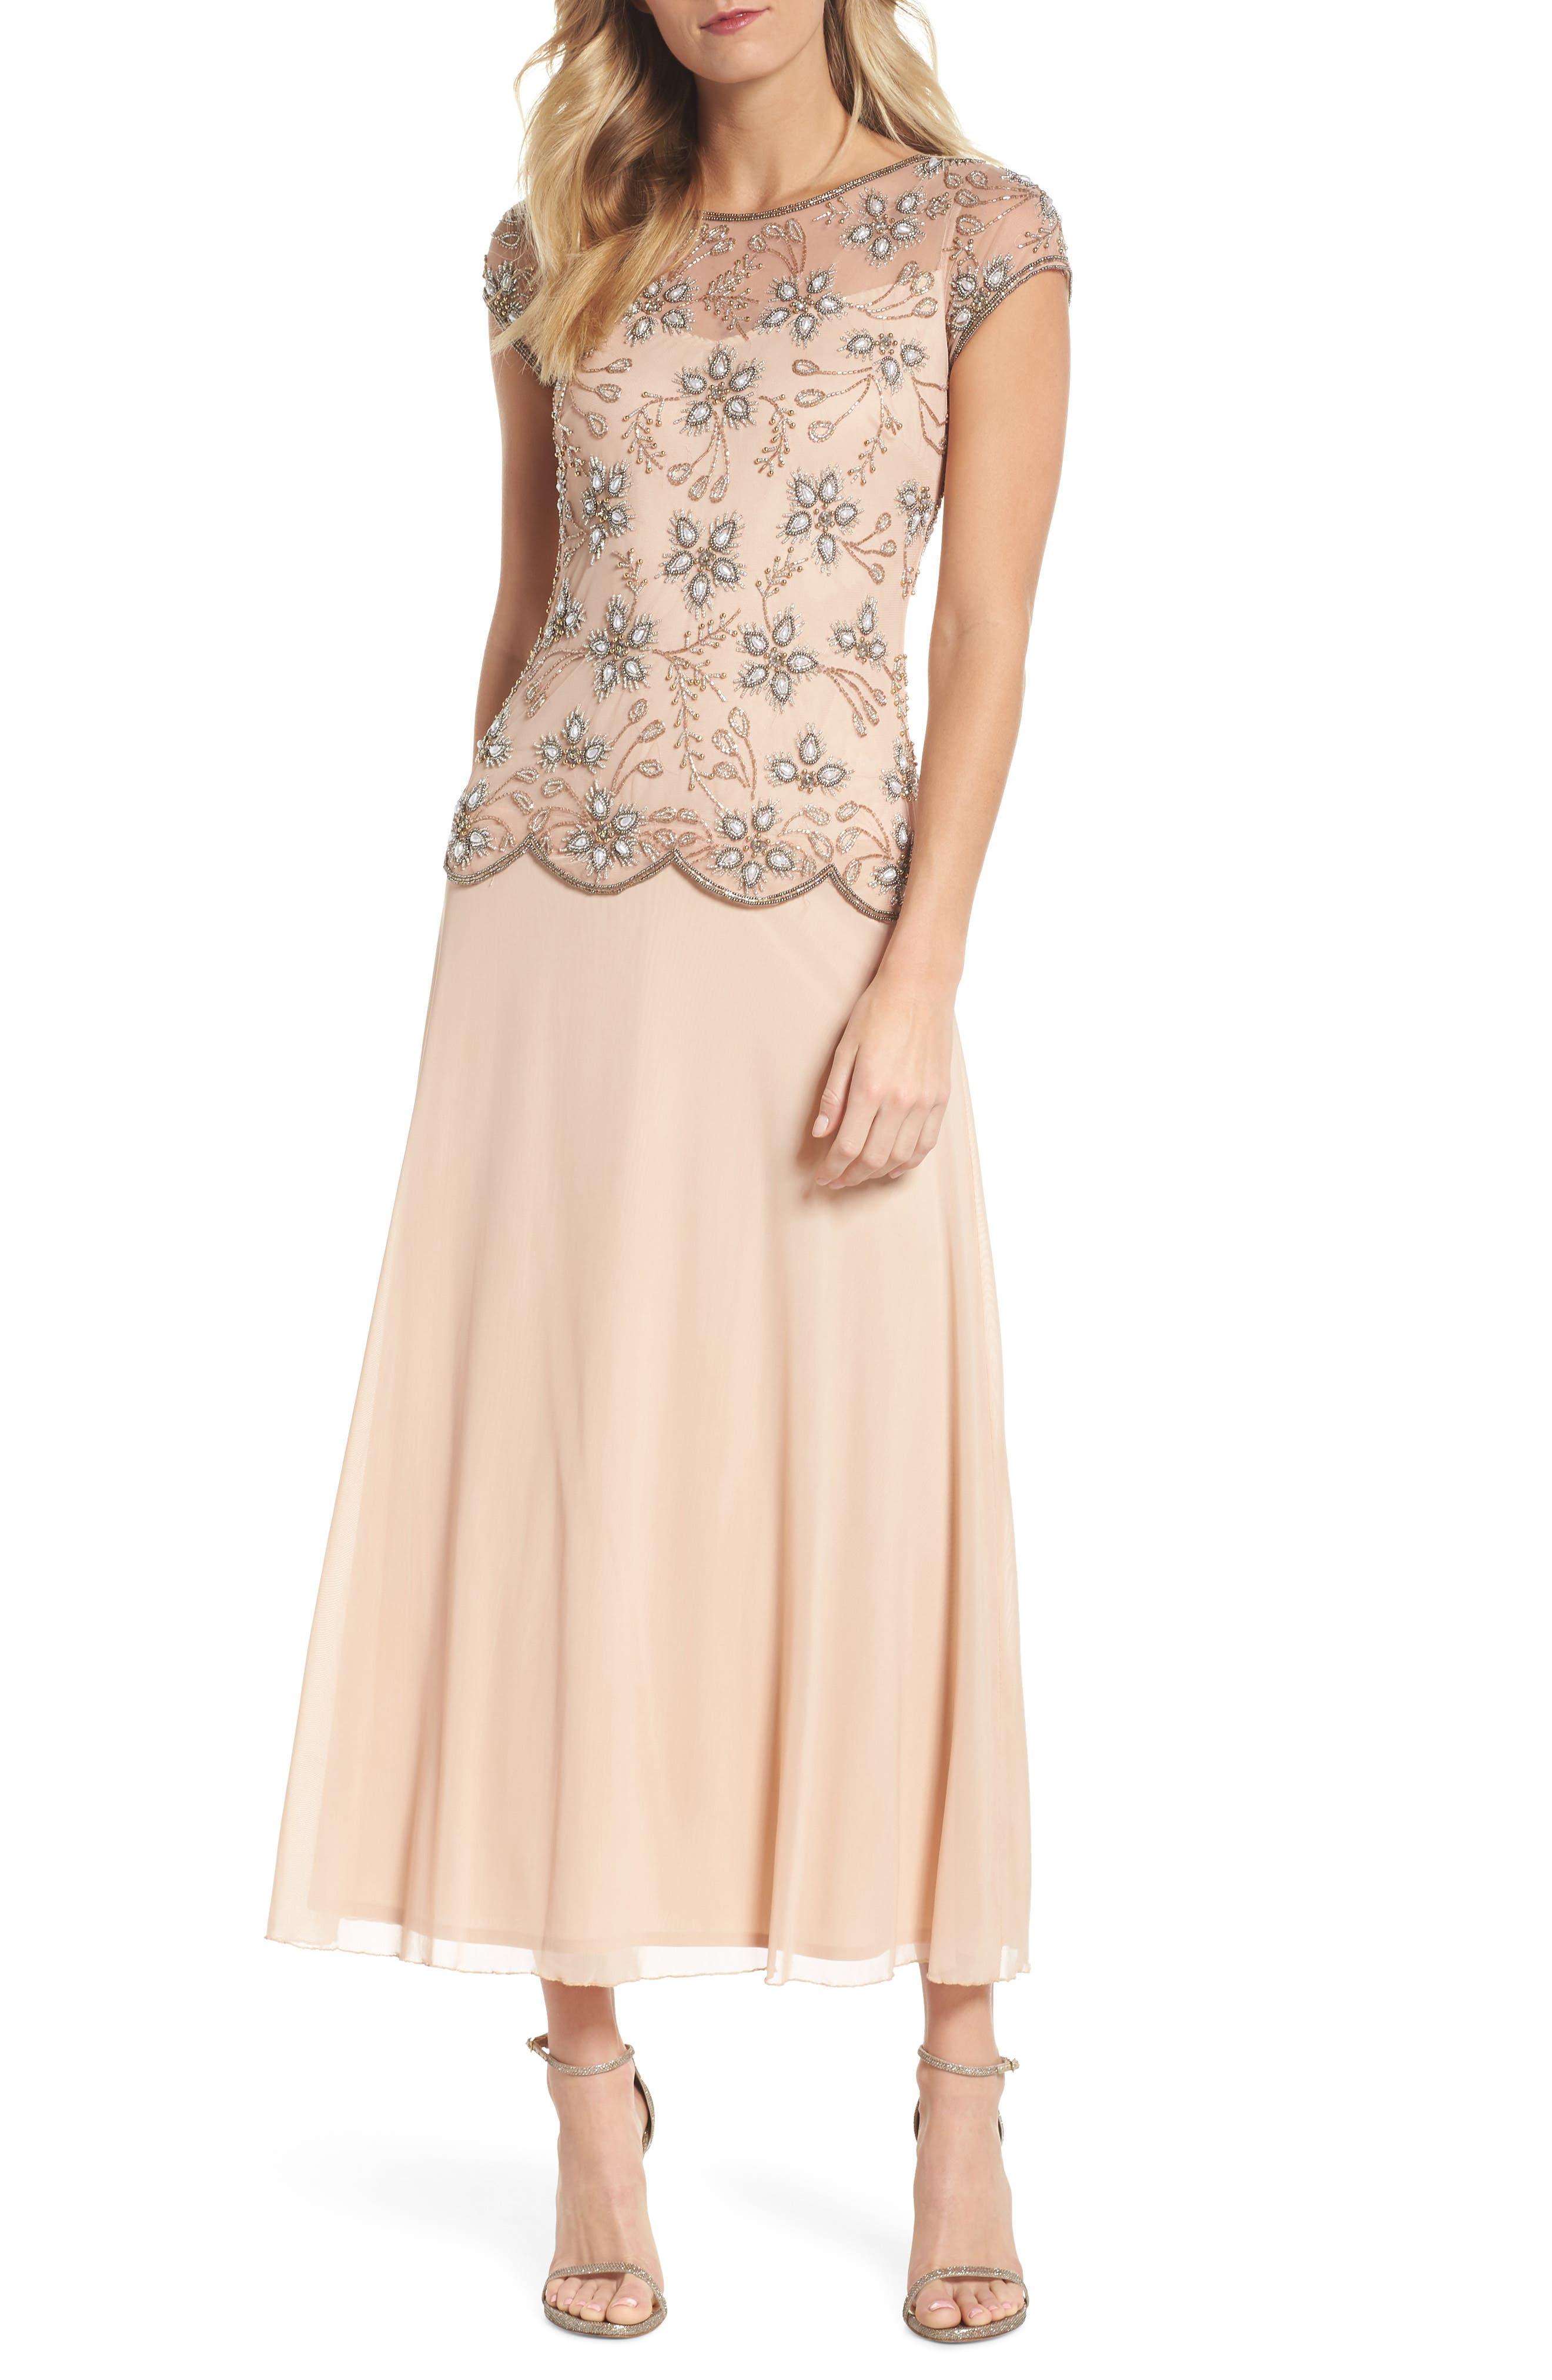 Nordstrom Mother of Bride Gown